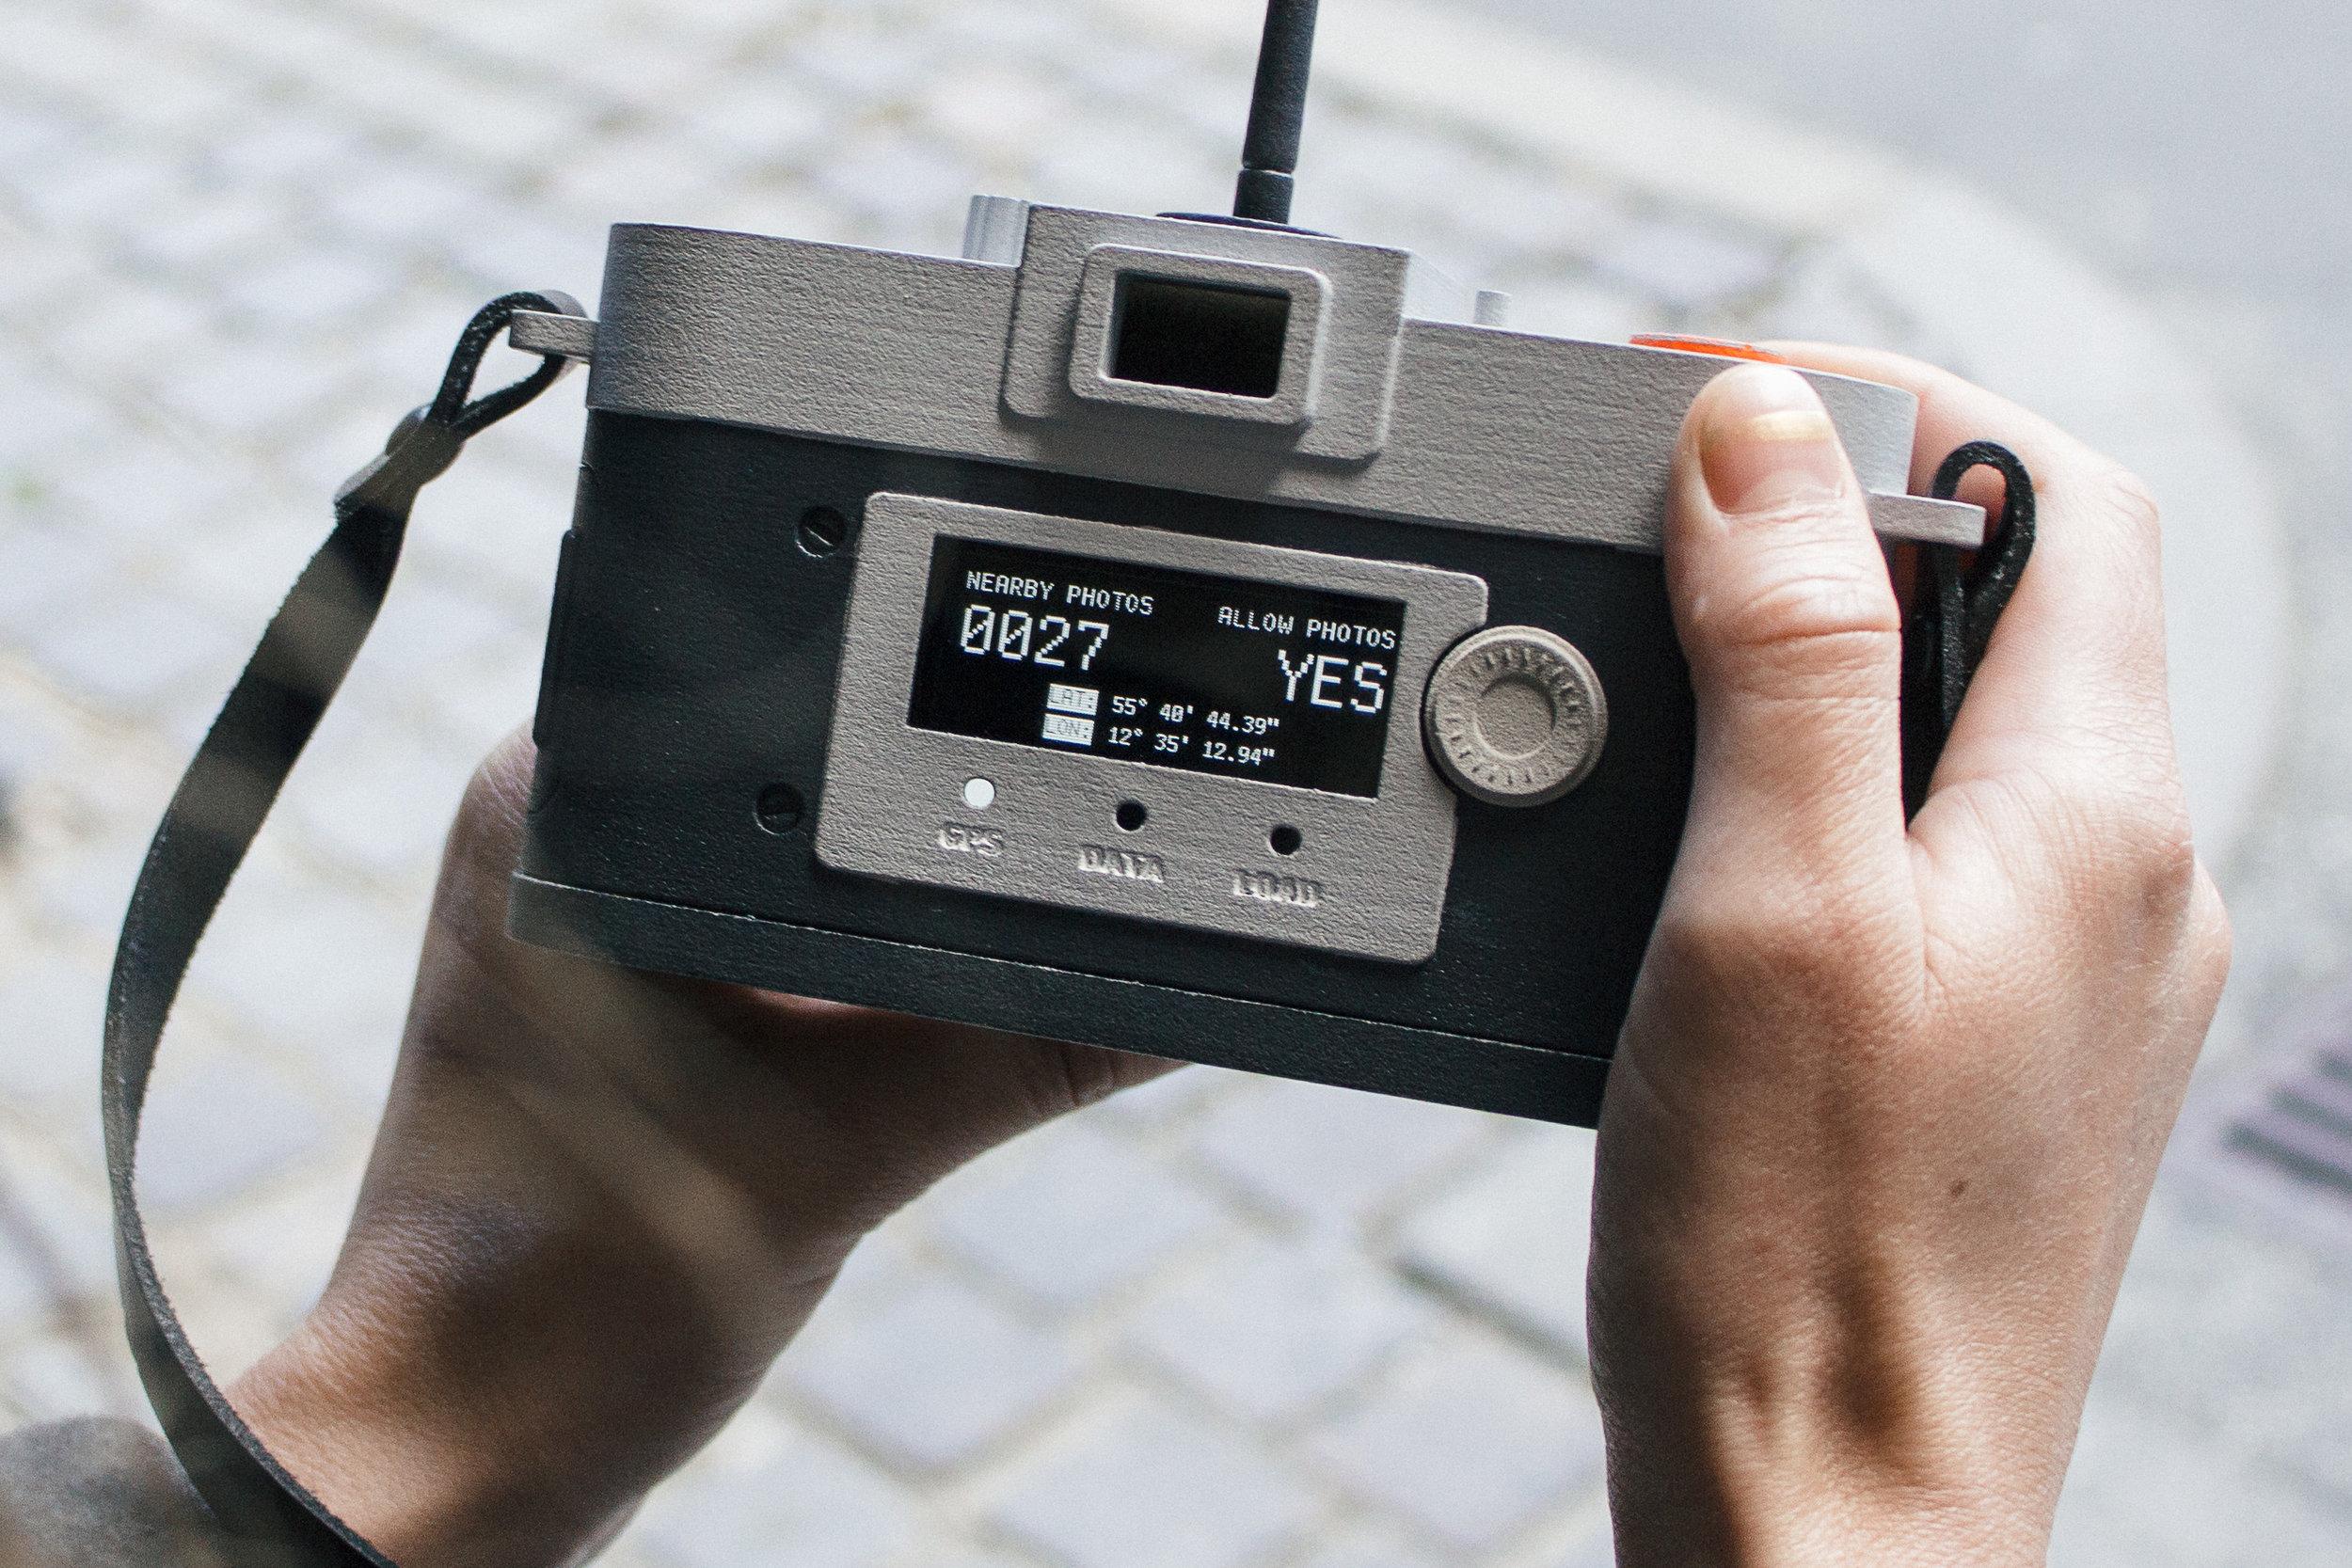 Philipp Schmitt,Camera Restricta - Yes (2015), Vue de l'arrière de la Camera Restricta acceptant de prendre une photo